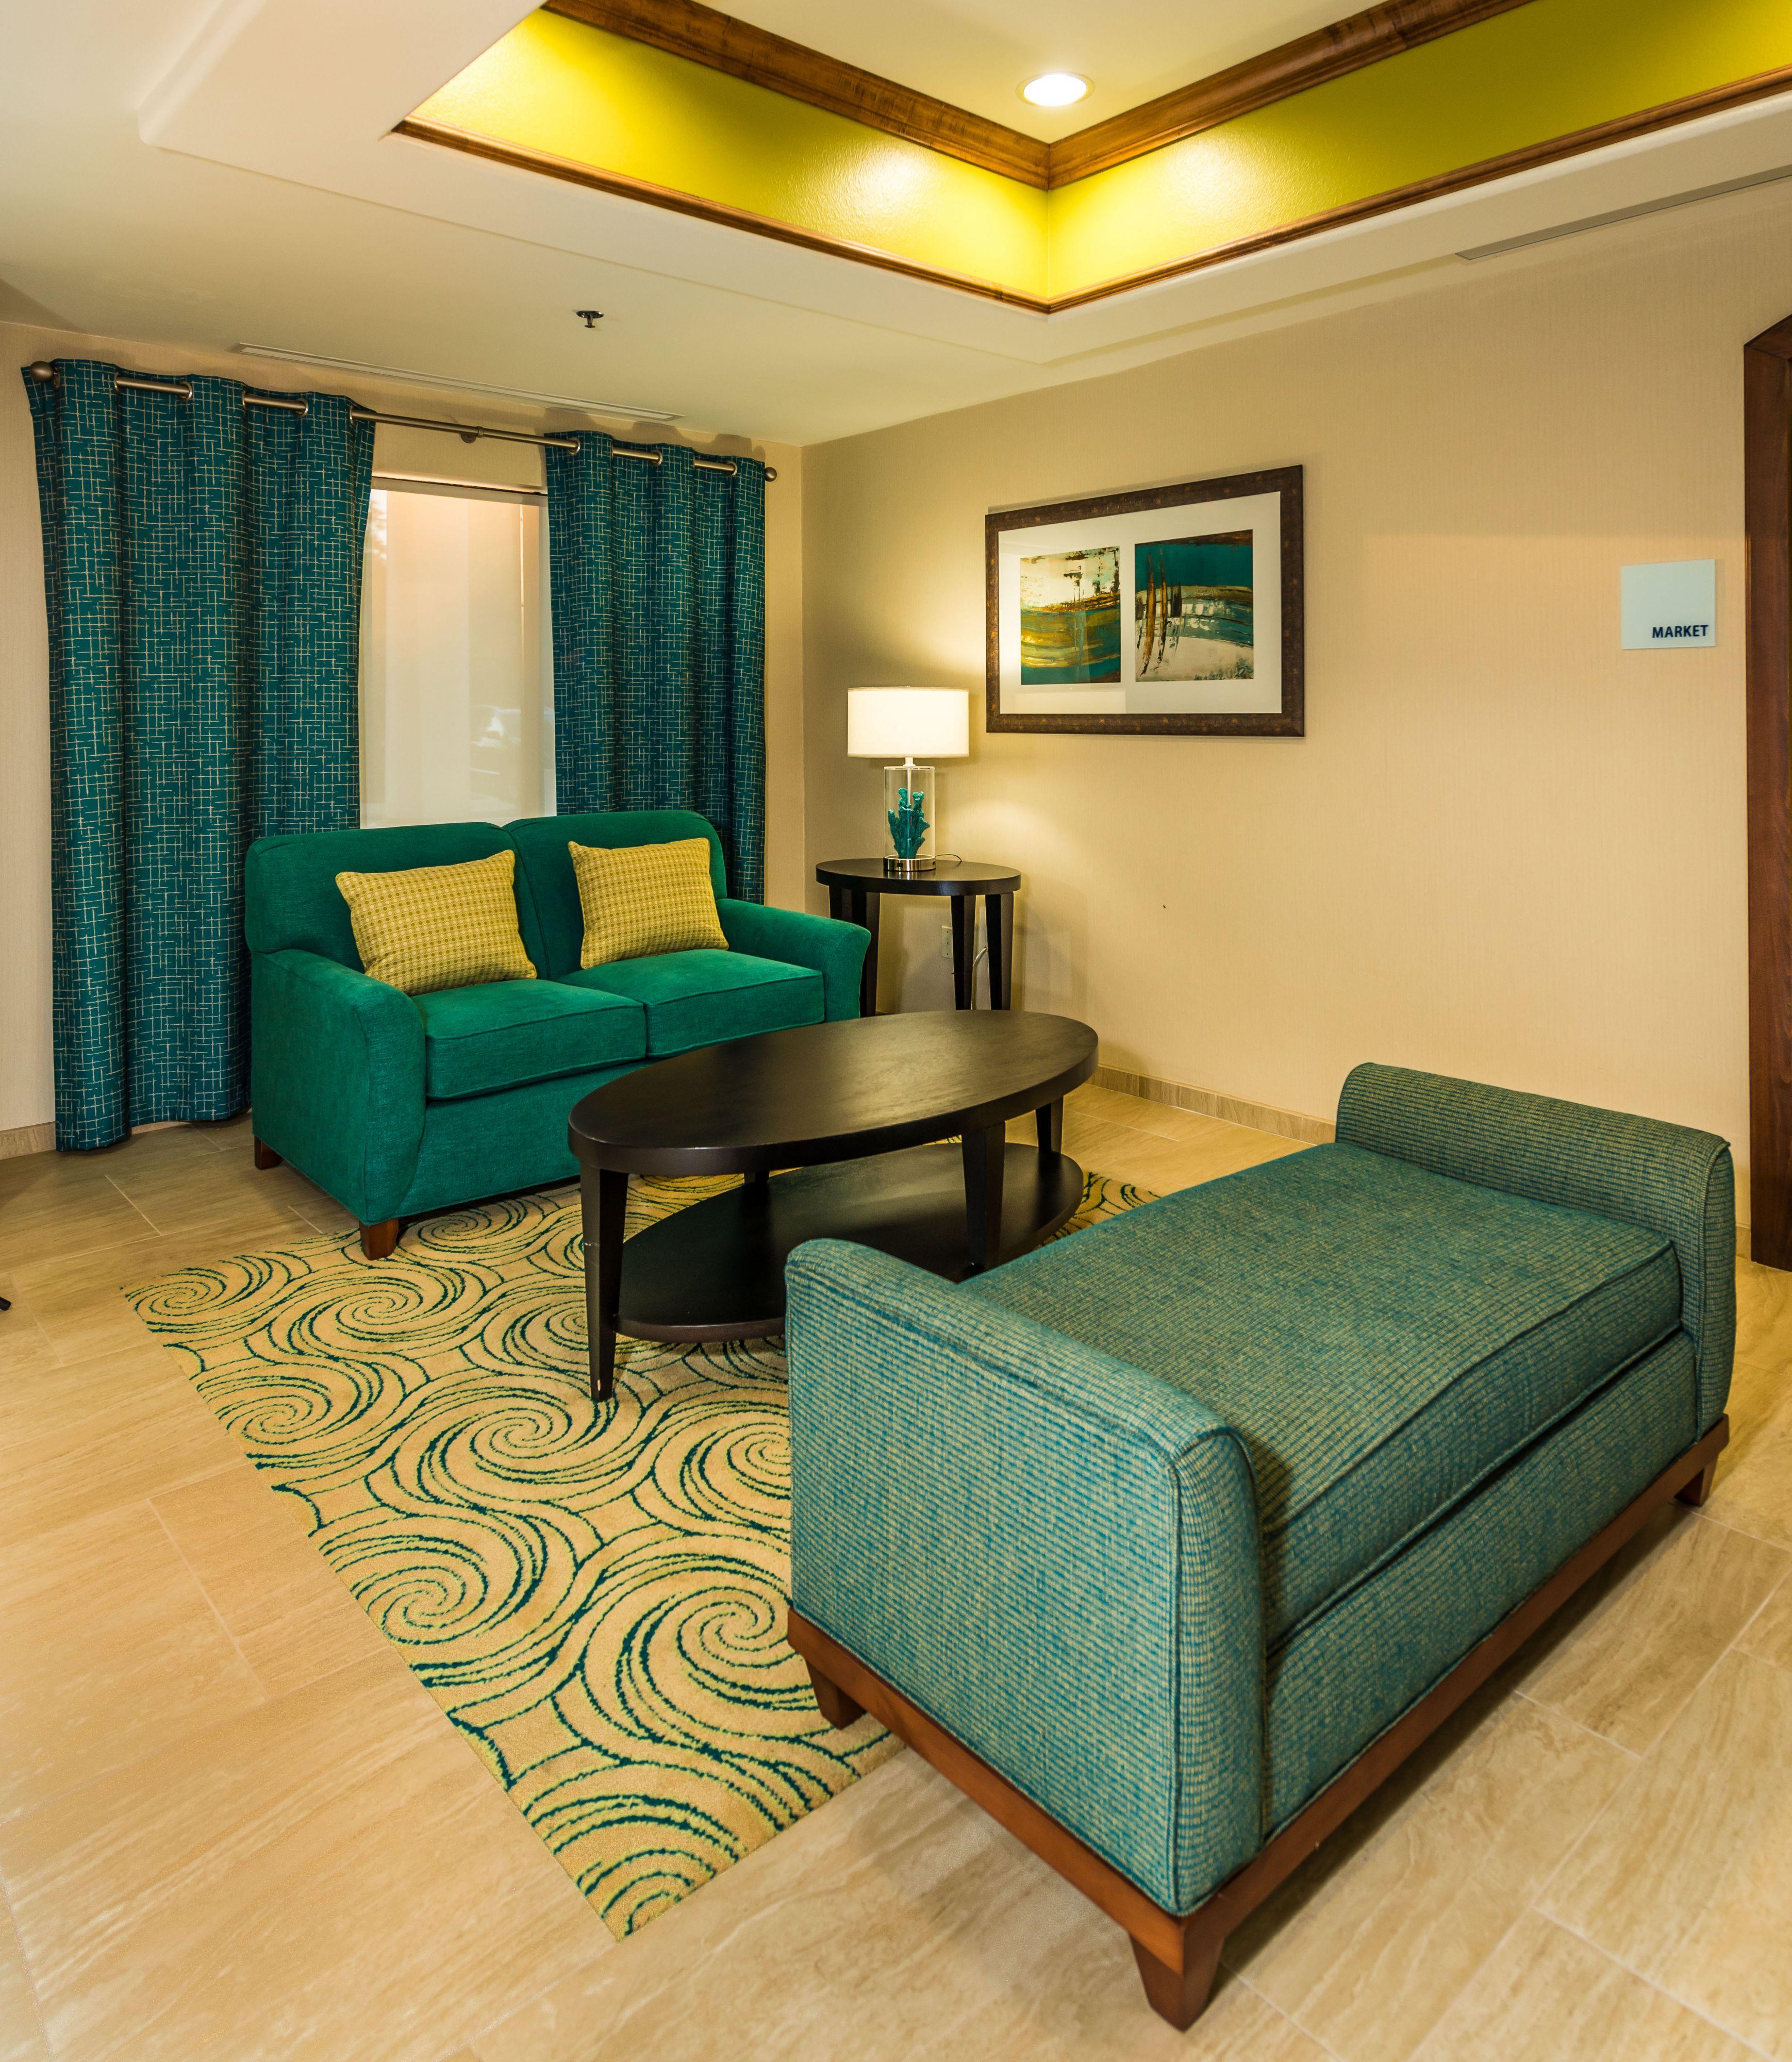 Holiday Inn Express & Suites Jacksonville - Blount Island image 4